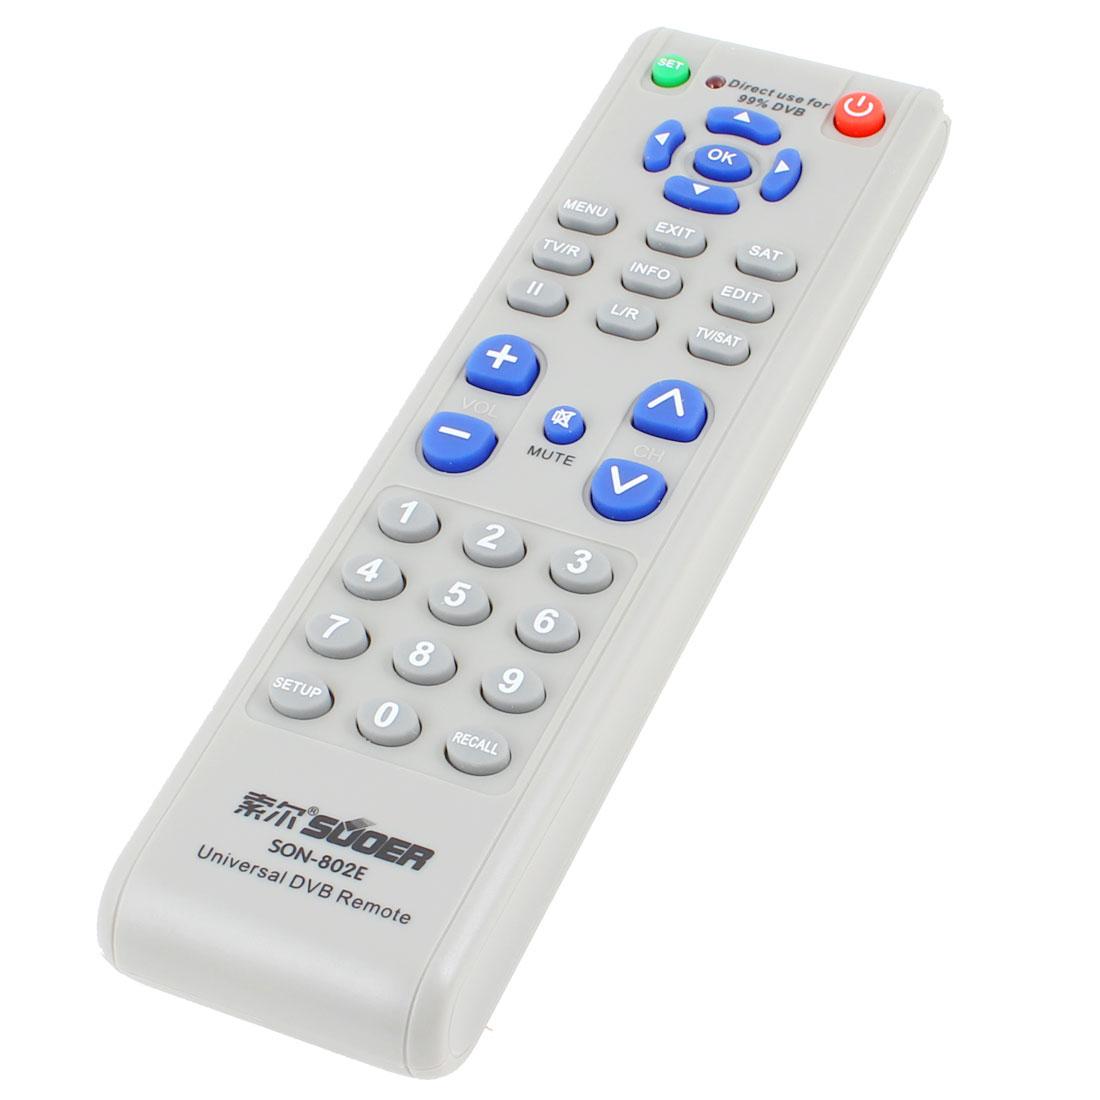 SON-802E Replacement Universal TV Remote Controller Gray